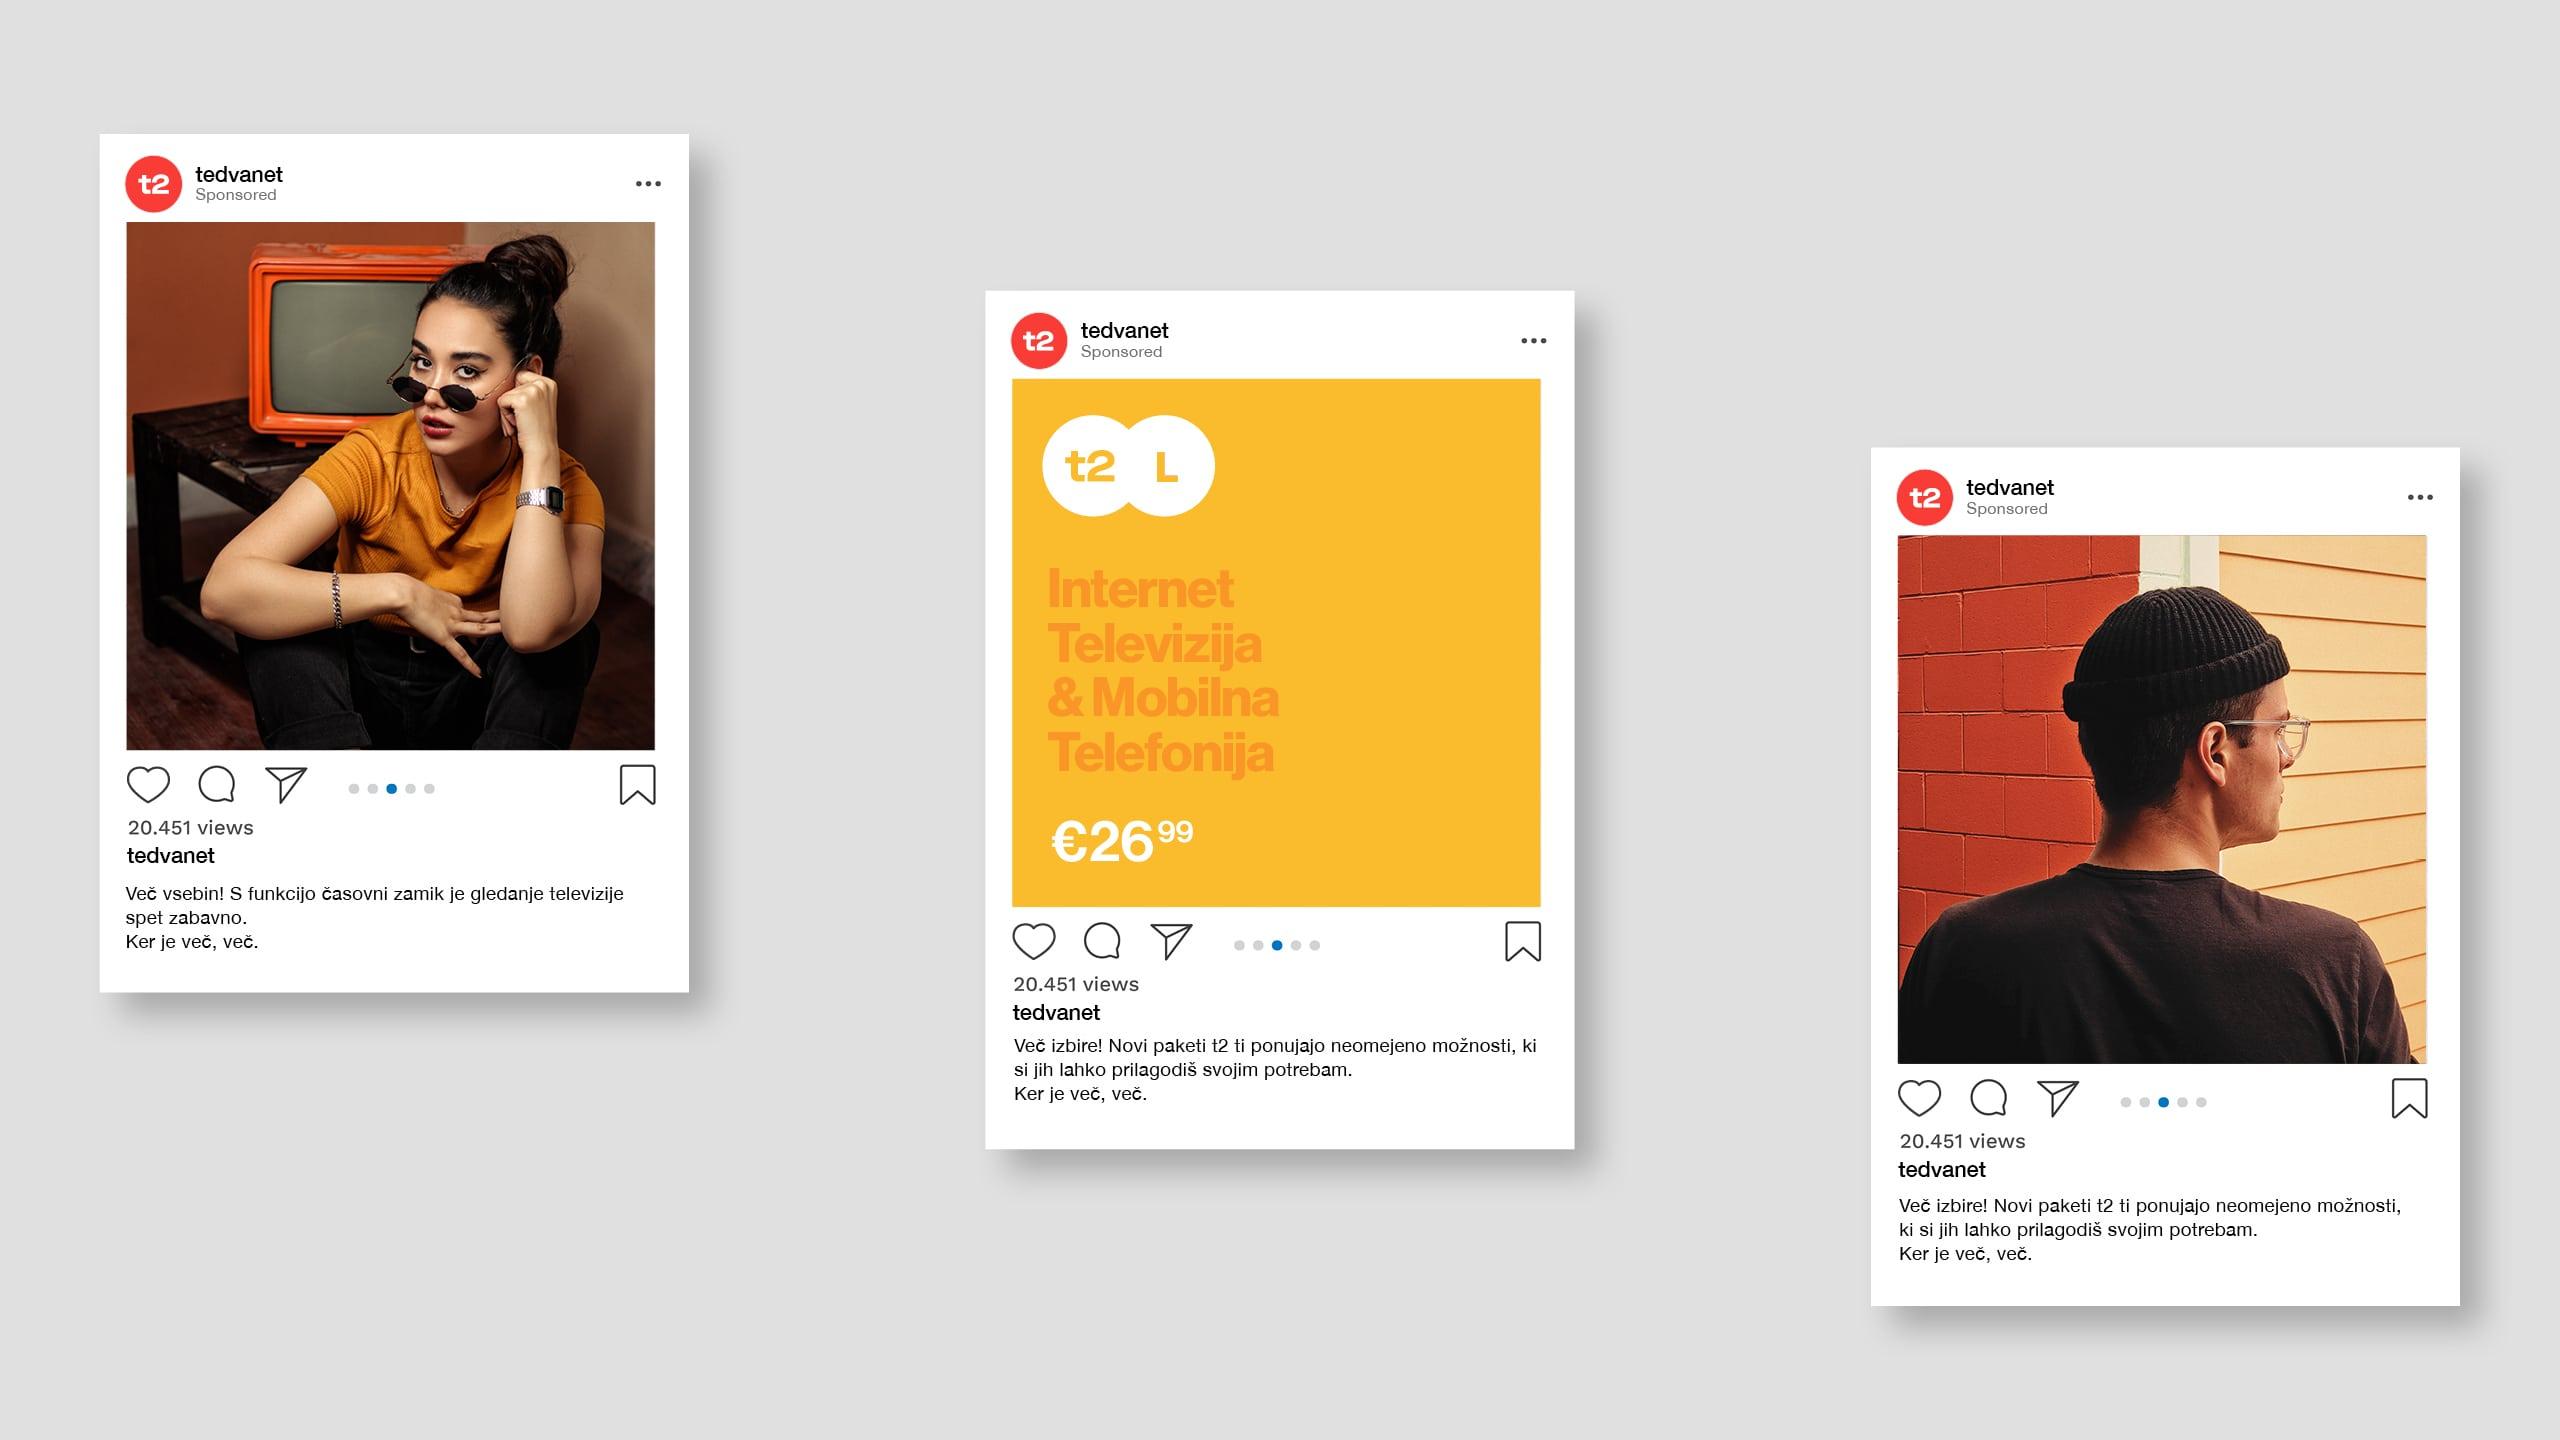 mantik-digital-branding-development-agency-creative-app-ui-web-branding-15-min-1